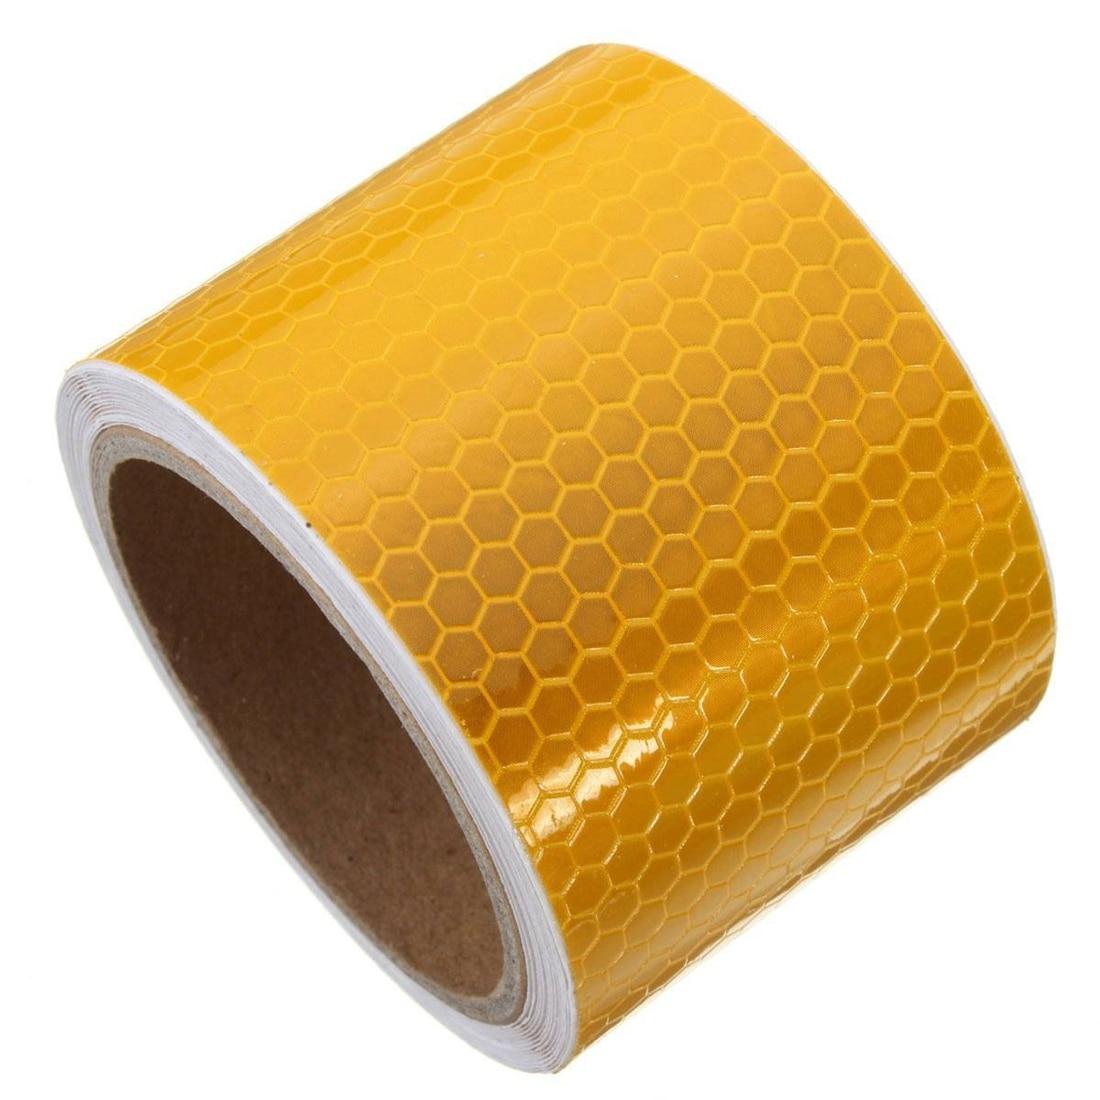 2019 Neuestes Design Mool 5 Cm X 3 M Klebeband Warnband Reflektor Band Sicherheit Band, Orange